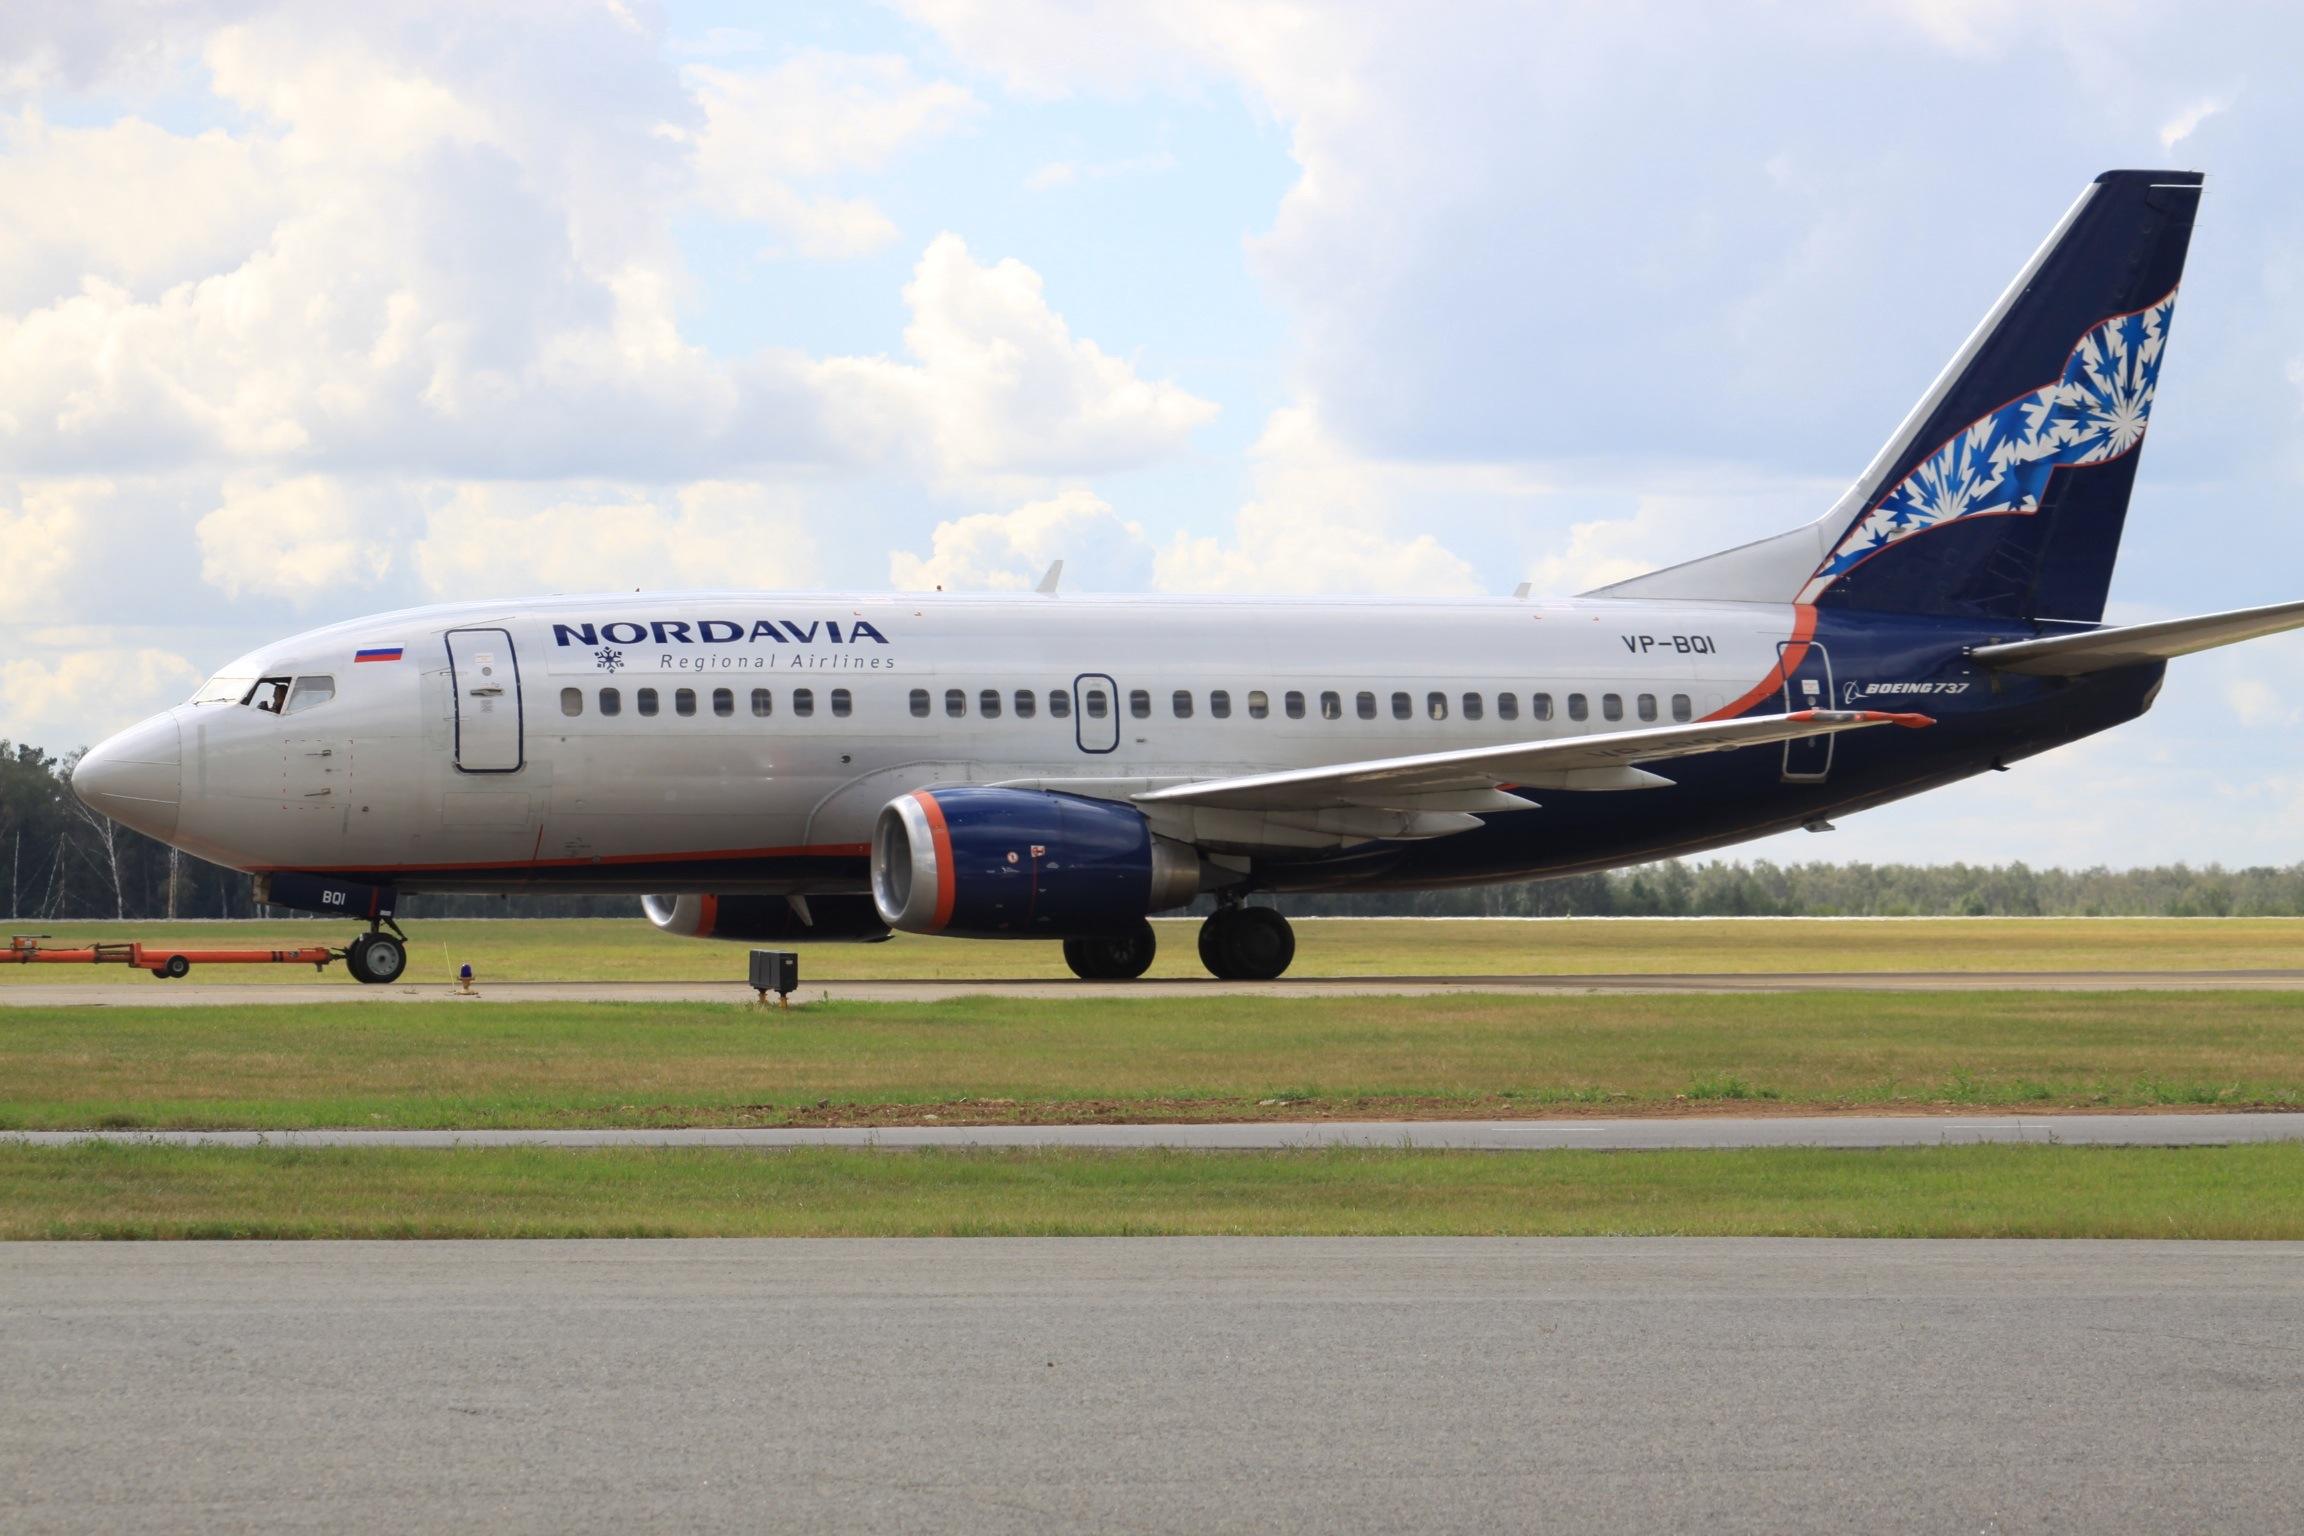 Boeing 737-500 fly fra Nordavia. Foto: Aeroprints.com / Wikimedia Commons.